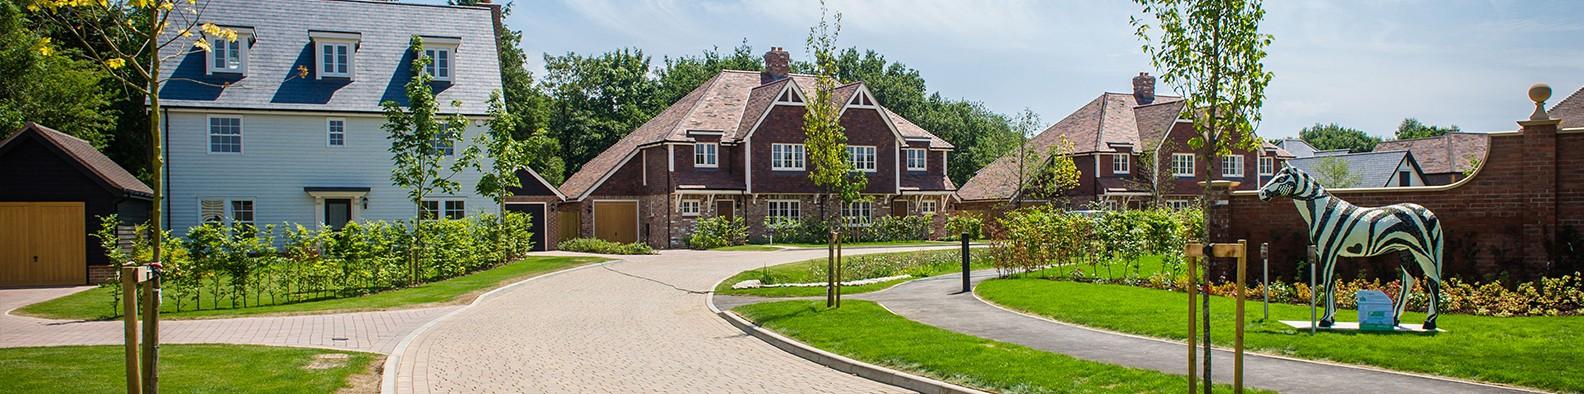 Millwood Designer Homes Linkedin